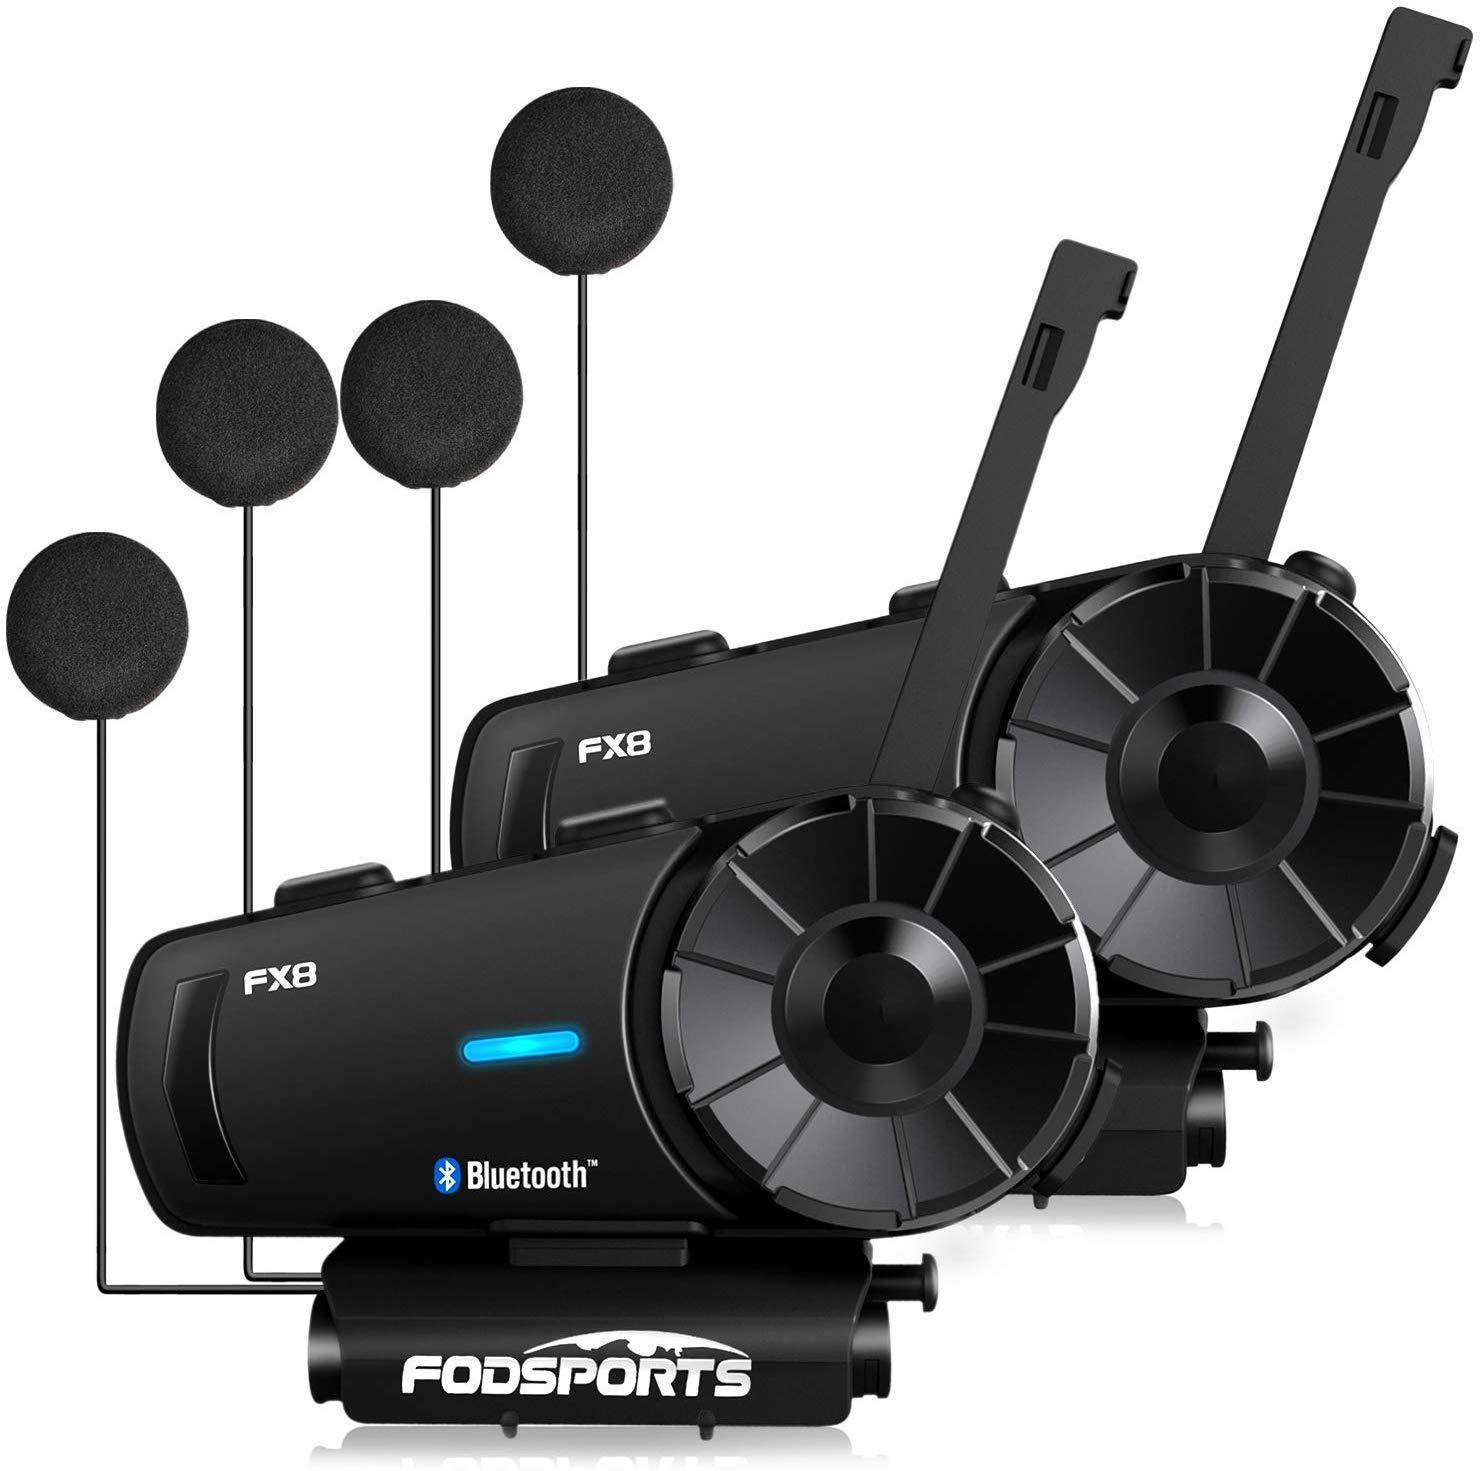 Motorcycle Bluetooth Fodsports FX8 Communication